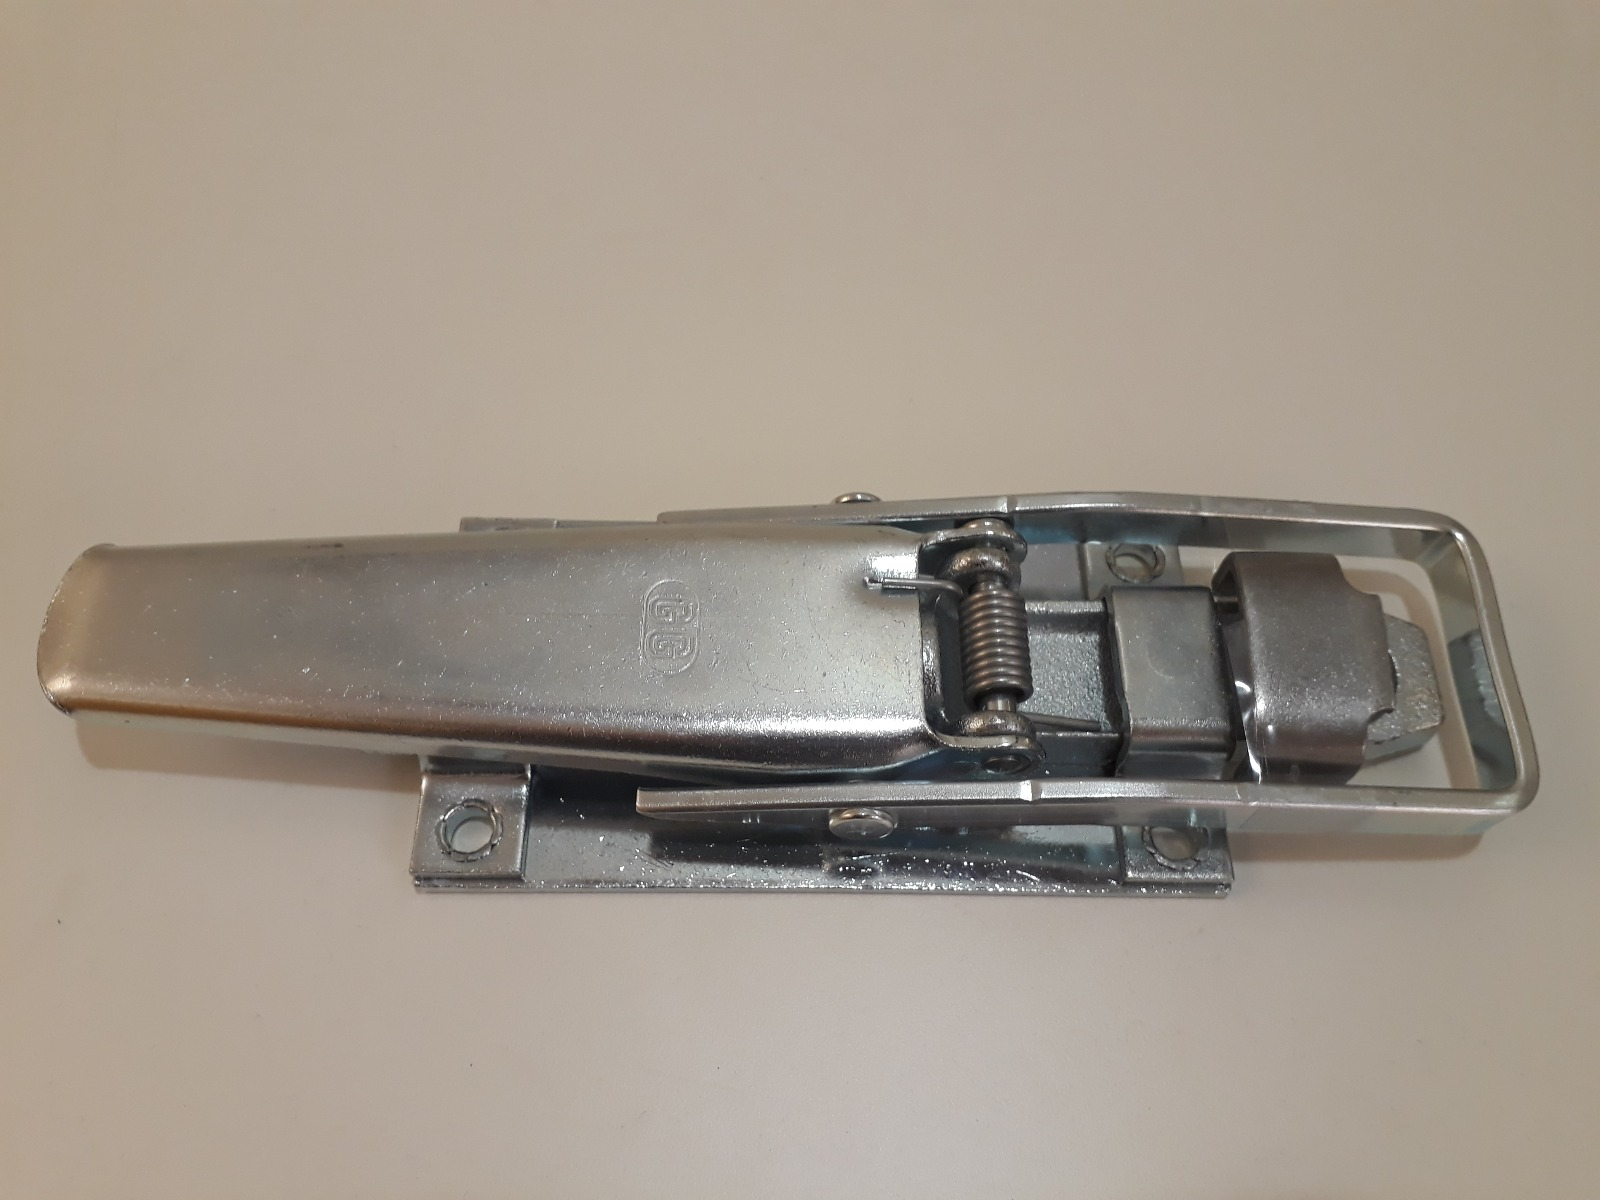 Flaklås L9F med 18,5 mm svetsbygel